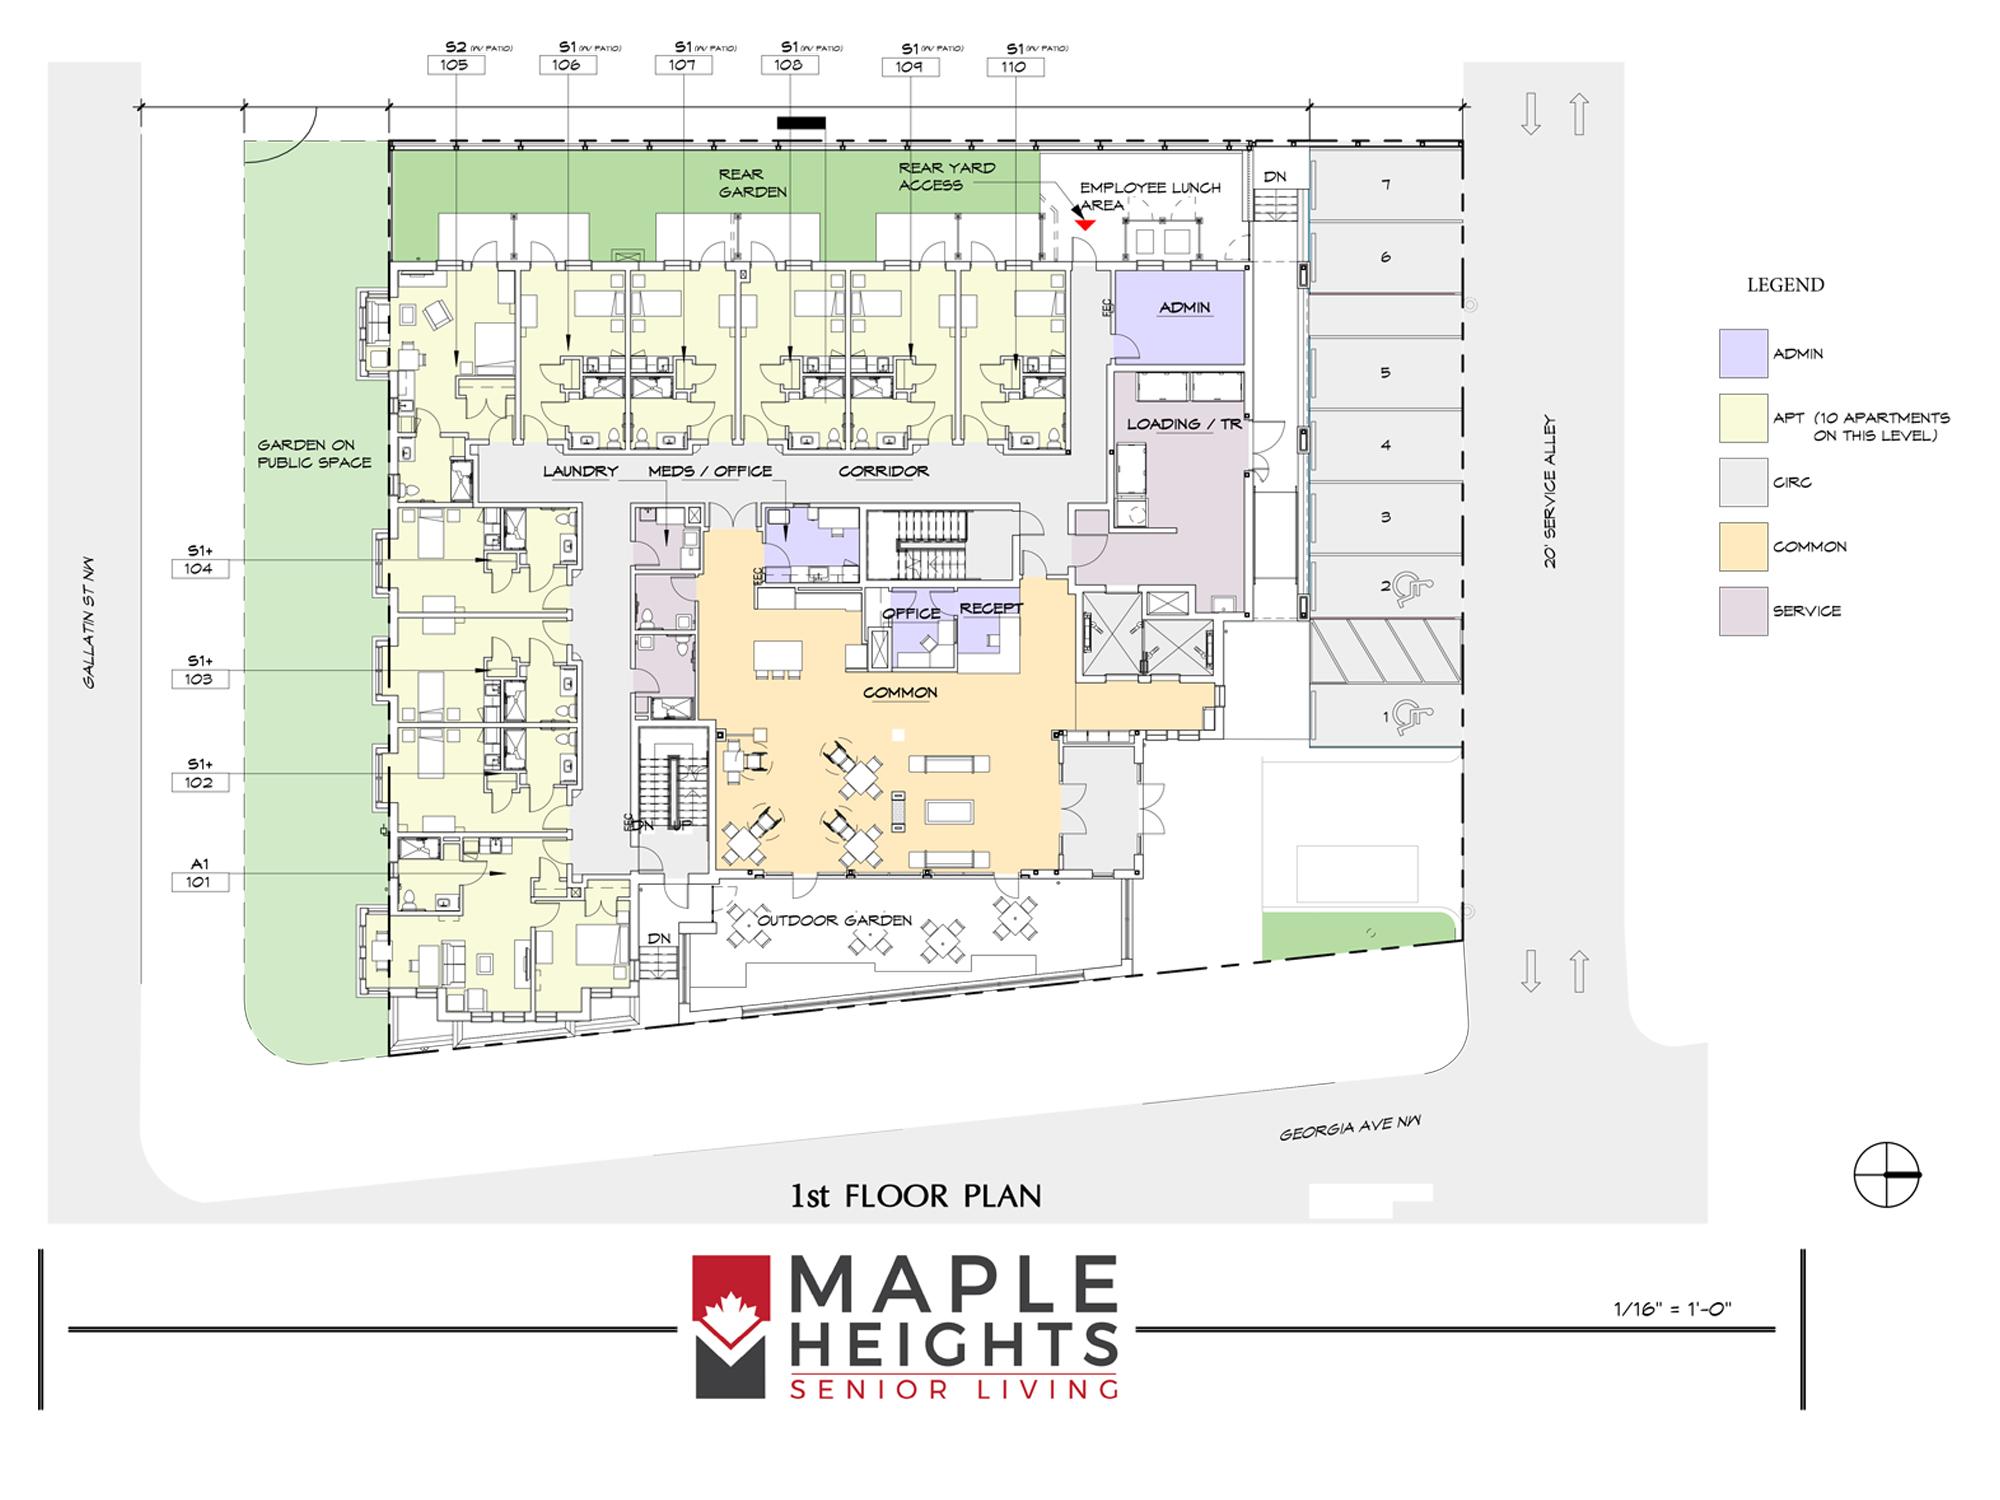 Washington DC Senior Living Floor Plan 1st Floor